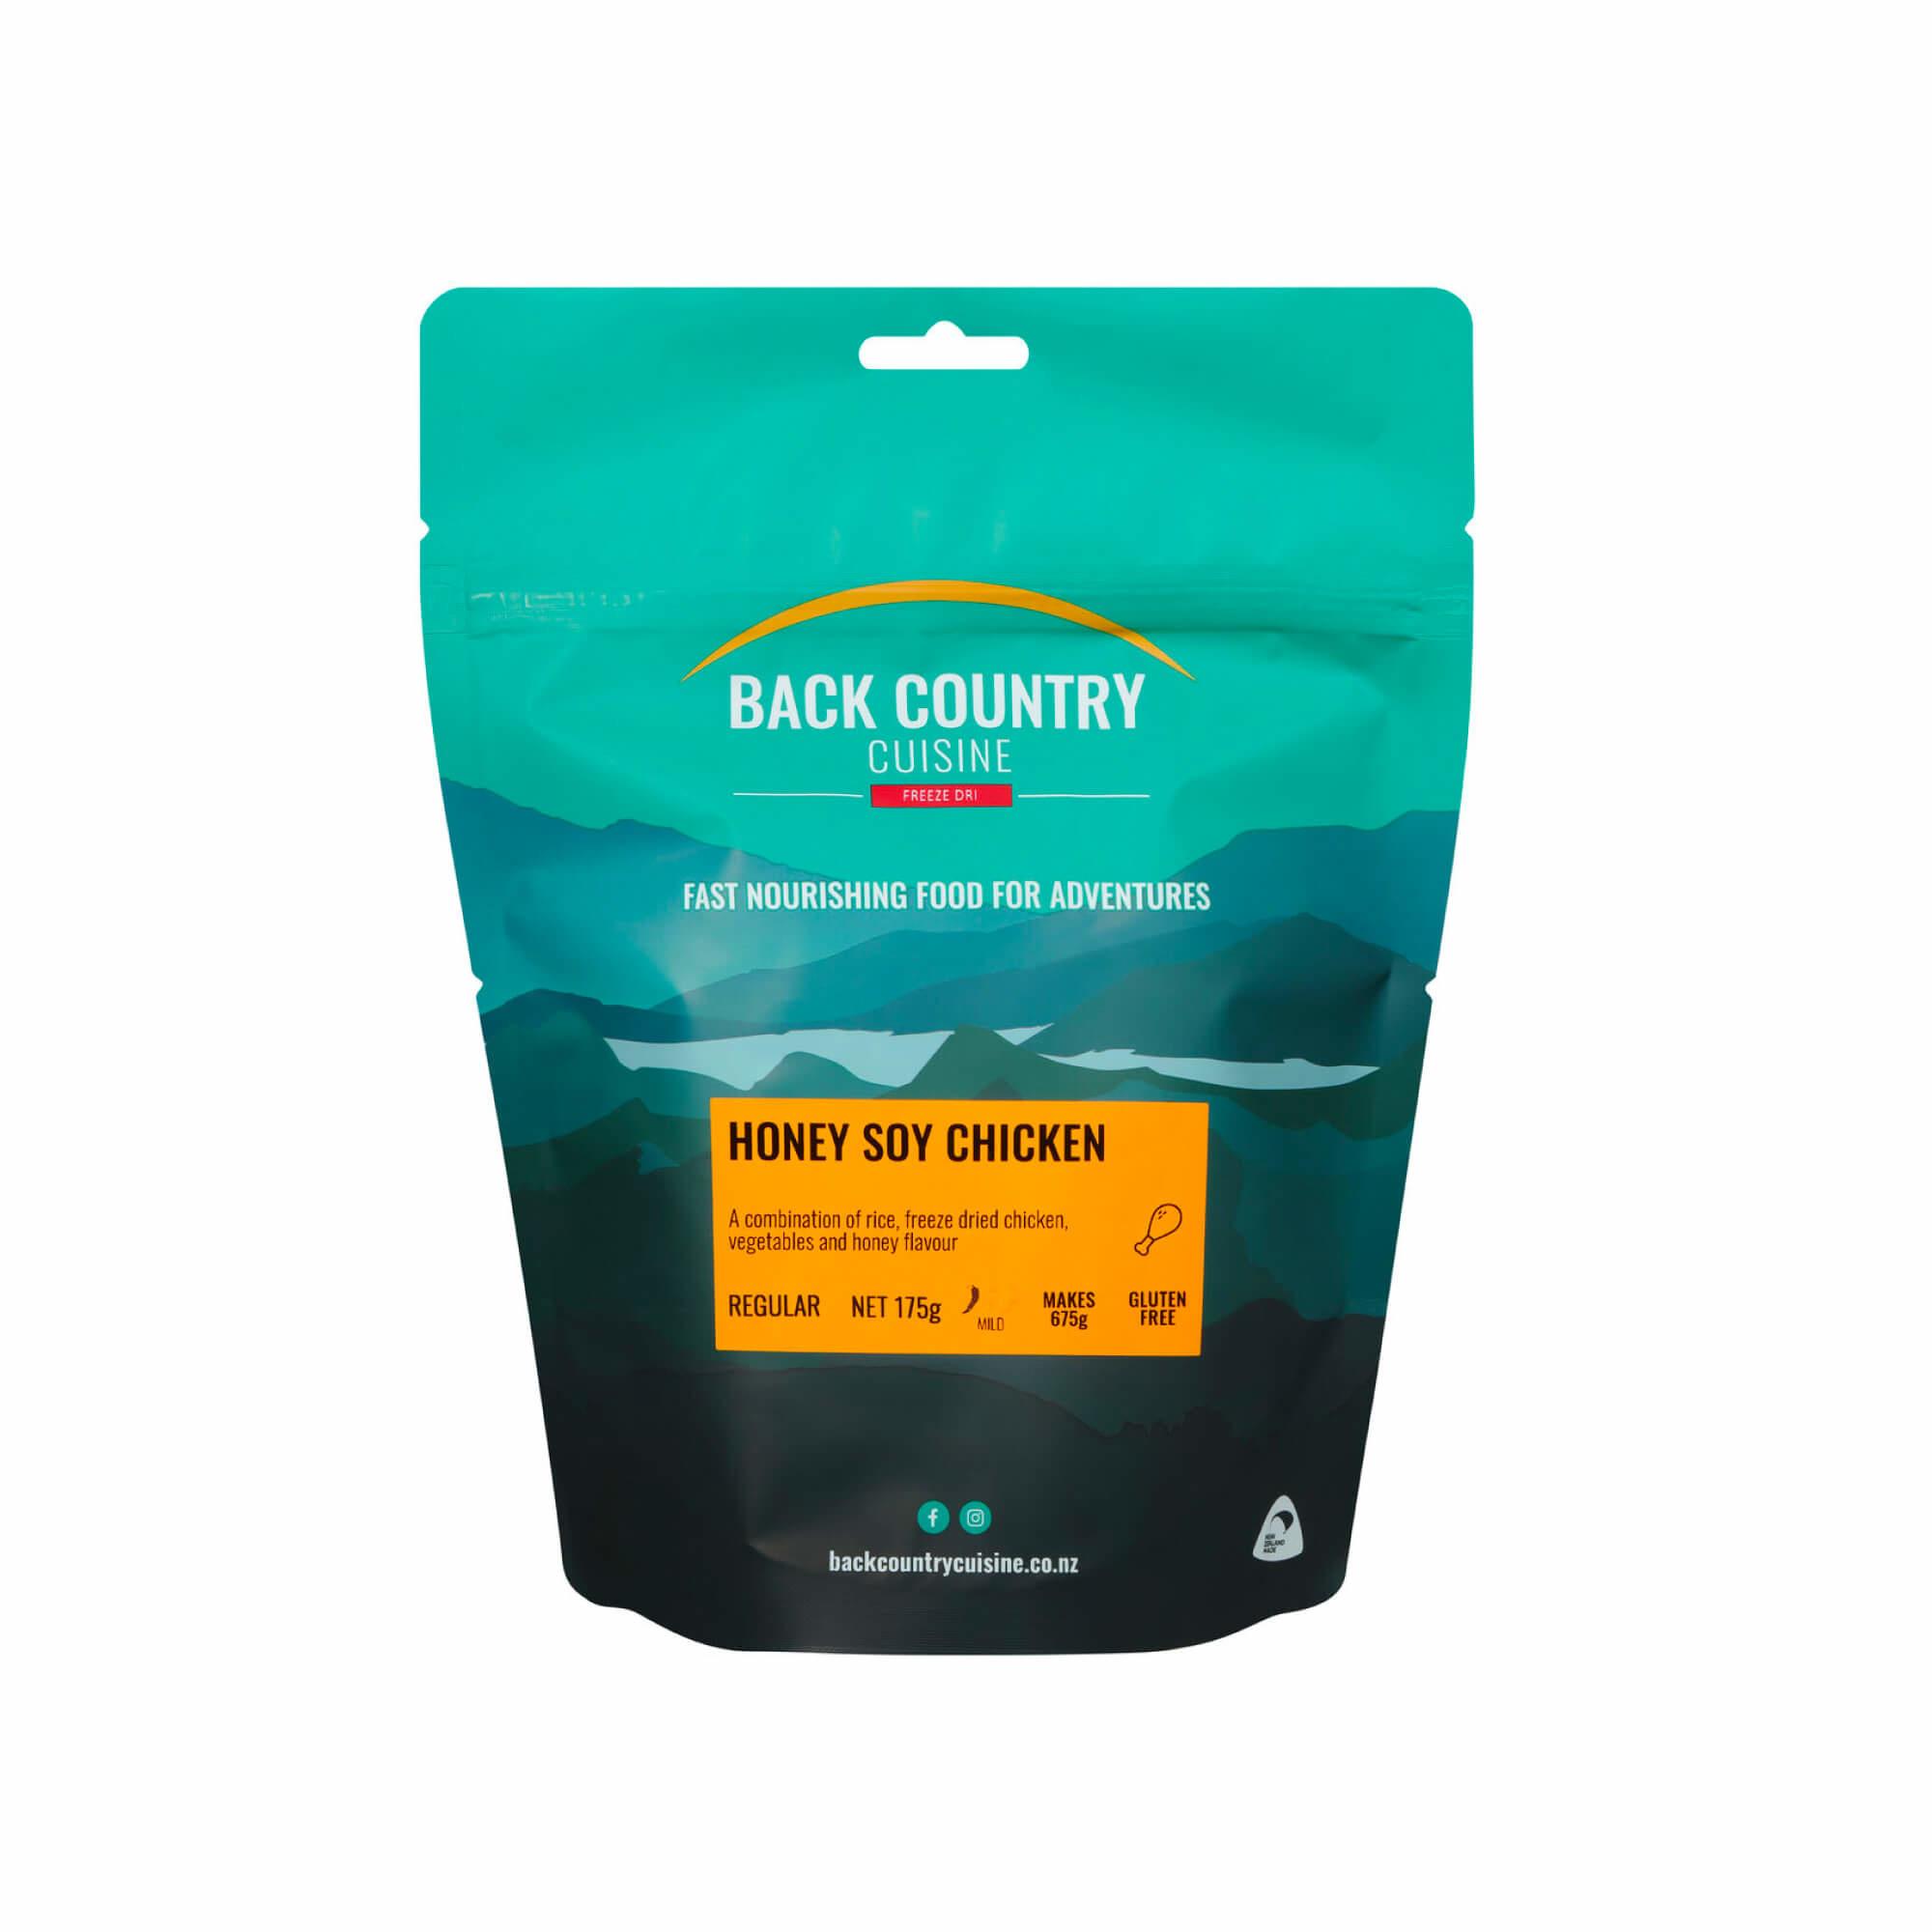 Back Country Cuisine Honey Soy Chicken Regular-1